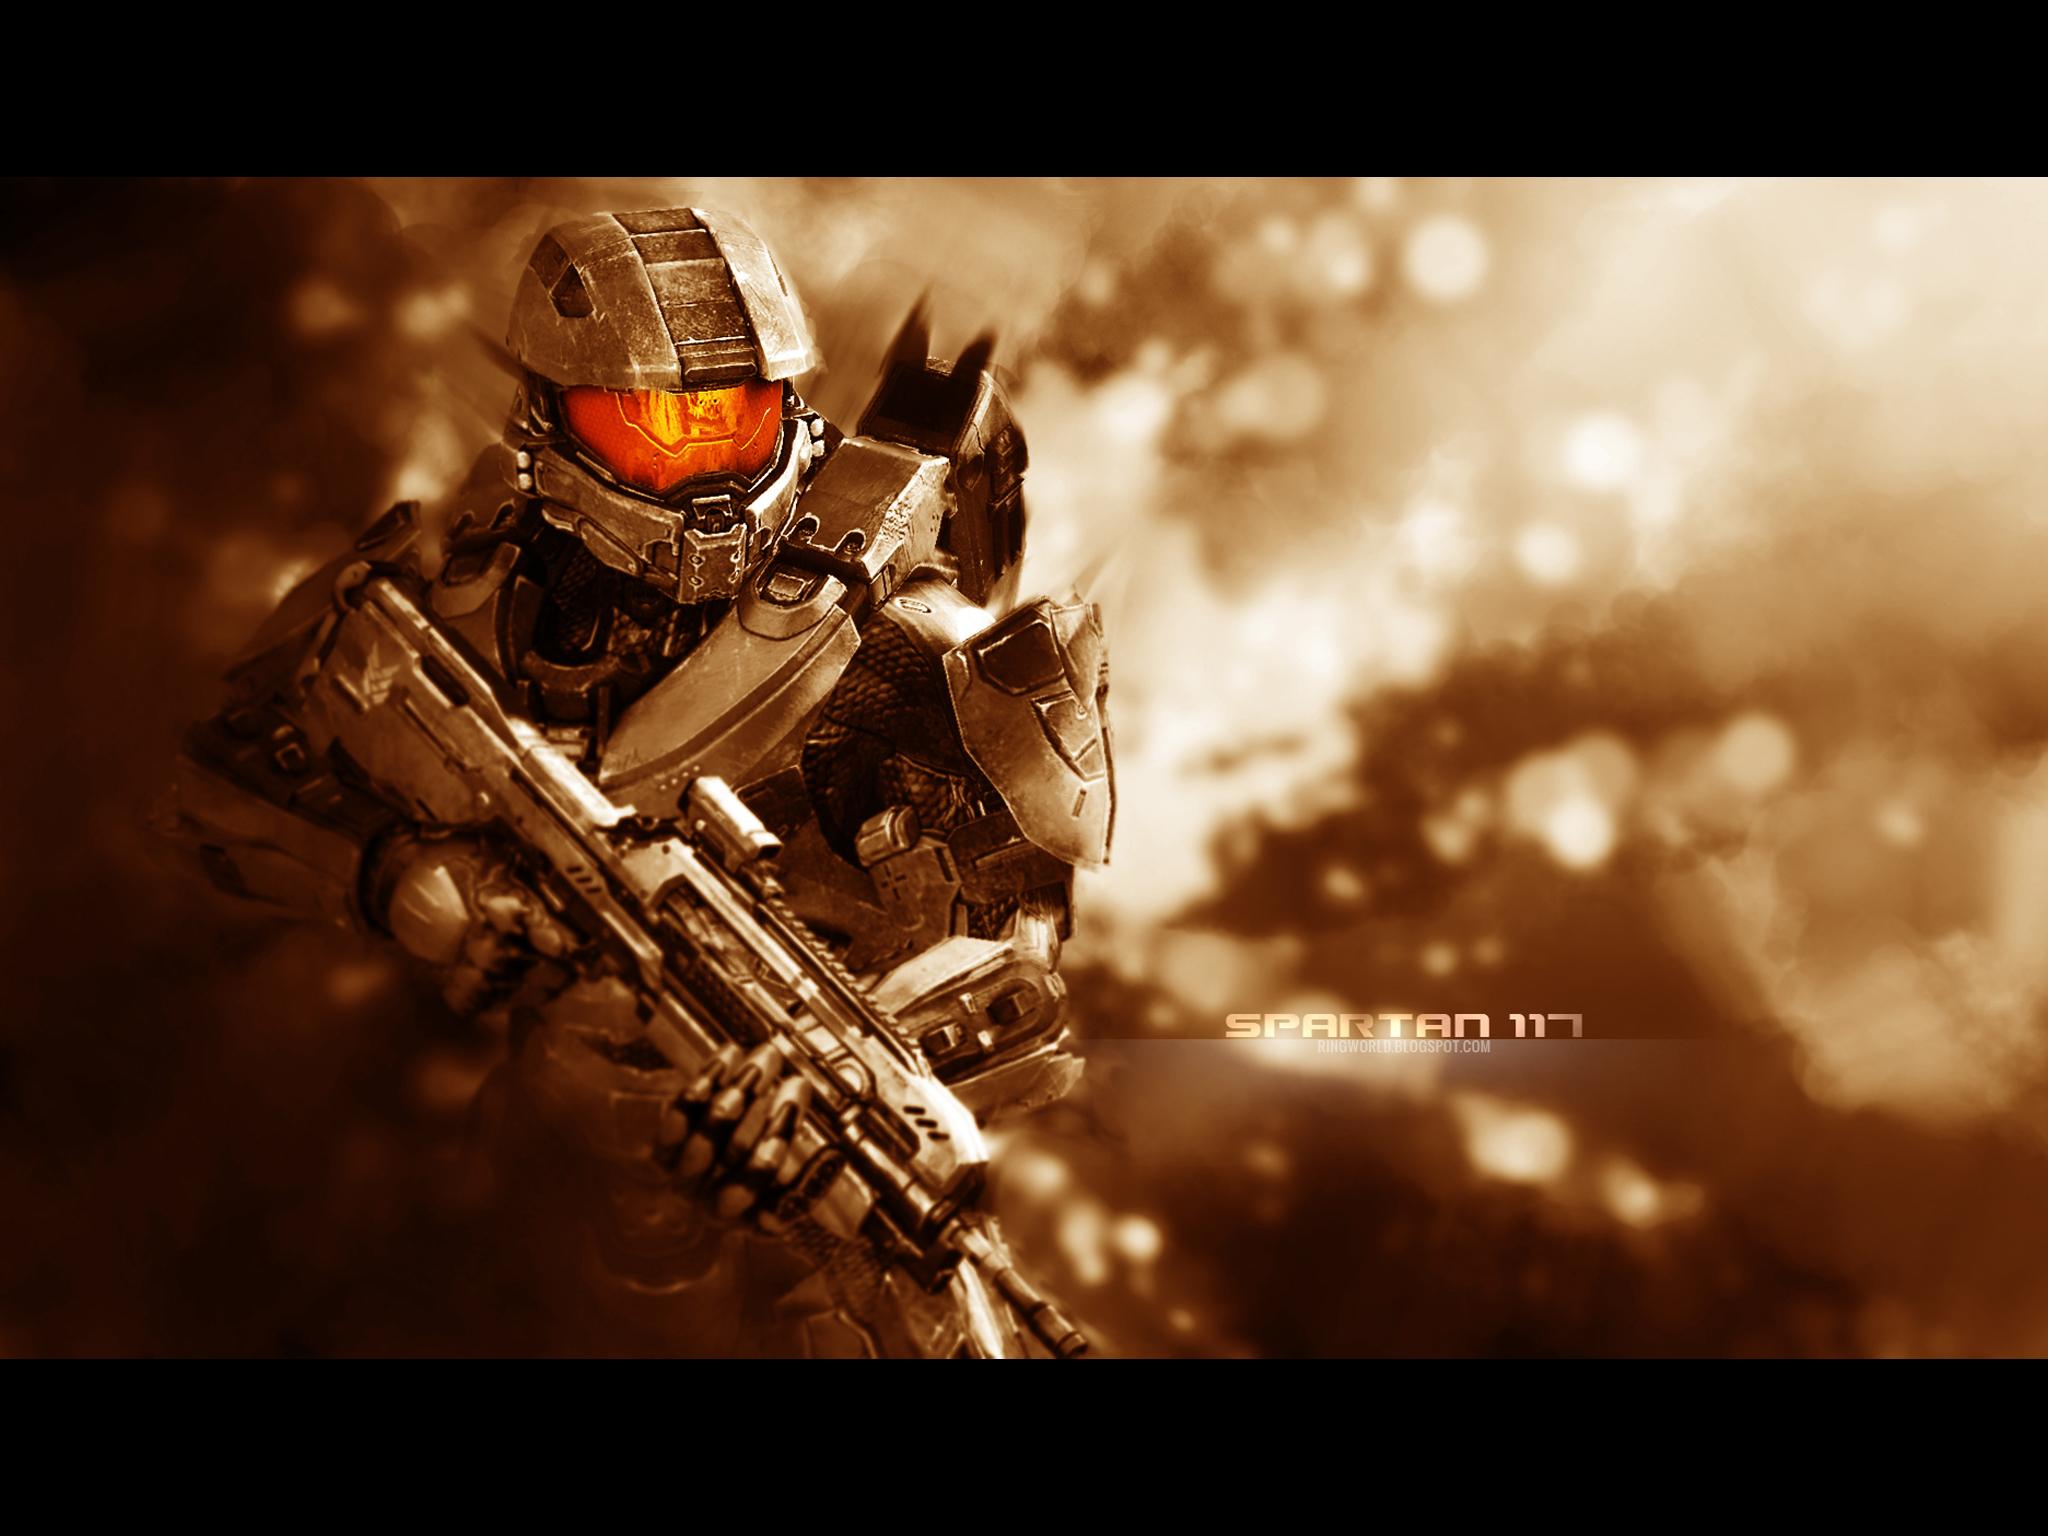 Halo 4 Master Chief Ipad Wallpaper 2 By Smyf On Deviantart